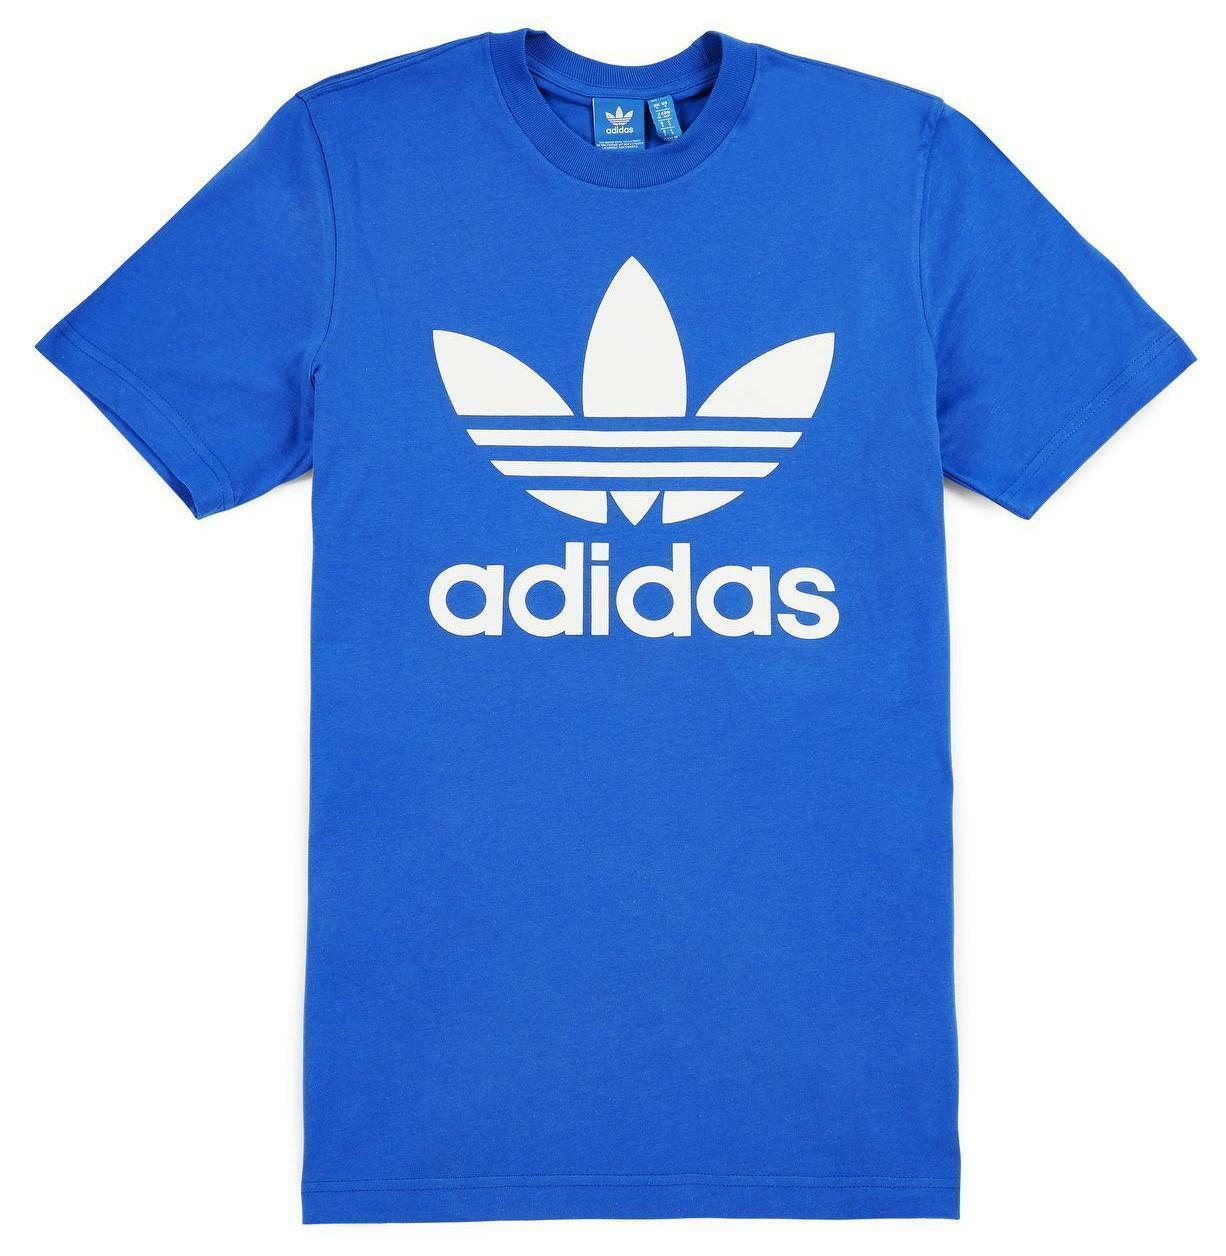 adidas adidas original trefoil t-shirt uomo blu